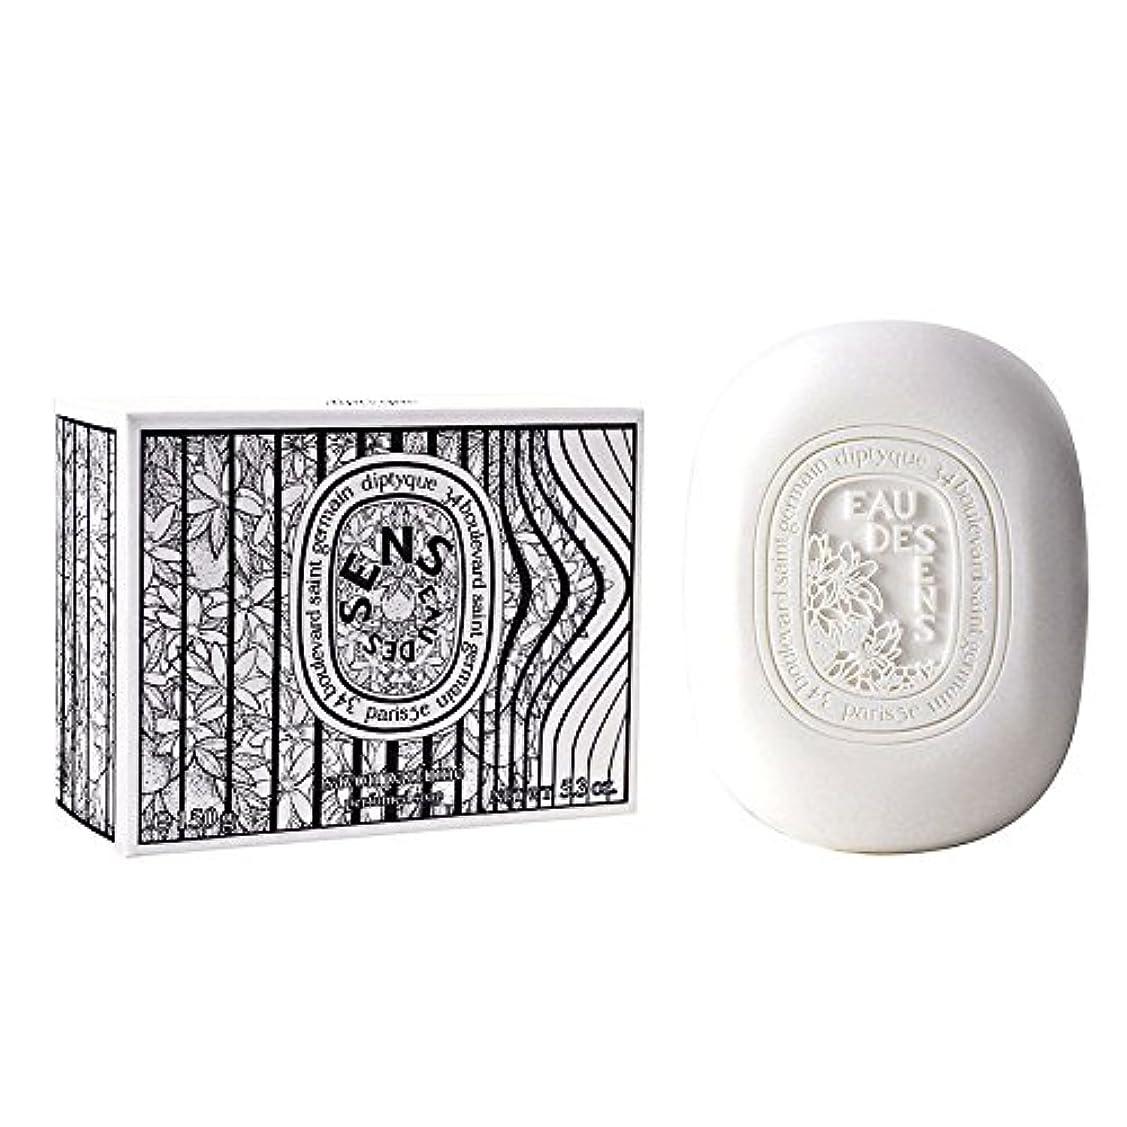 Diptyque Eau Des Sens (ディプティック オー デ センス) 150g Soap (石けん) for Women